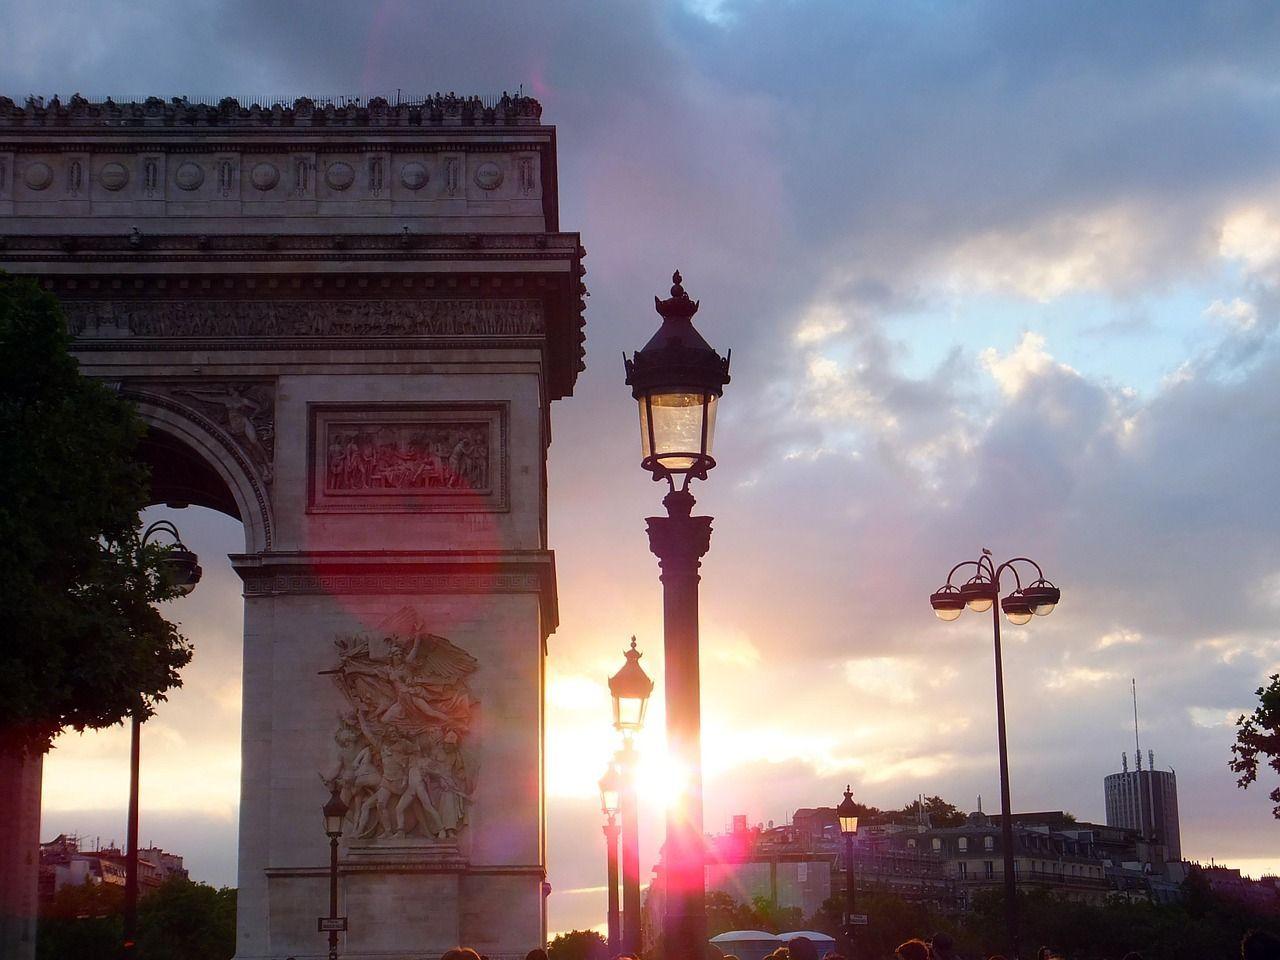 Parigi Arco di trionfo